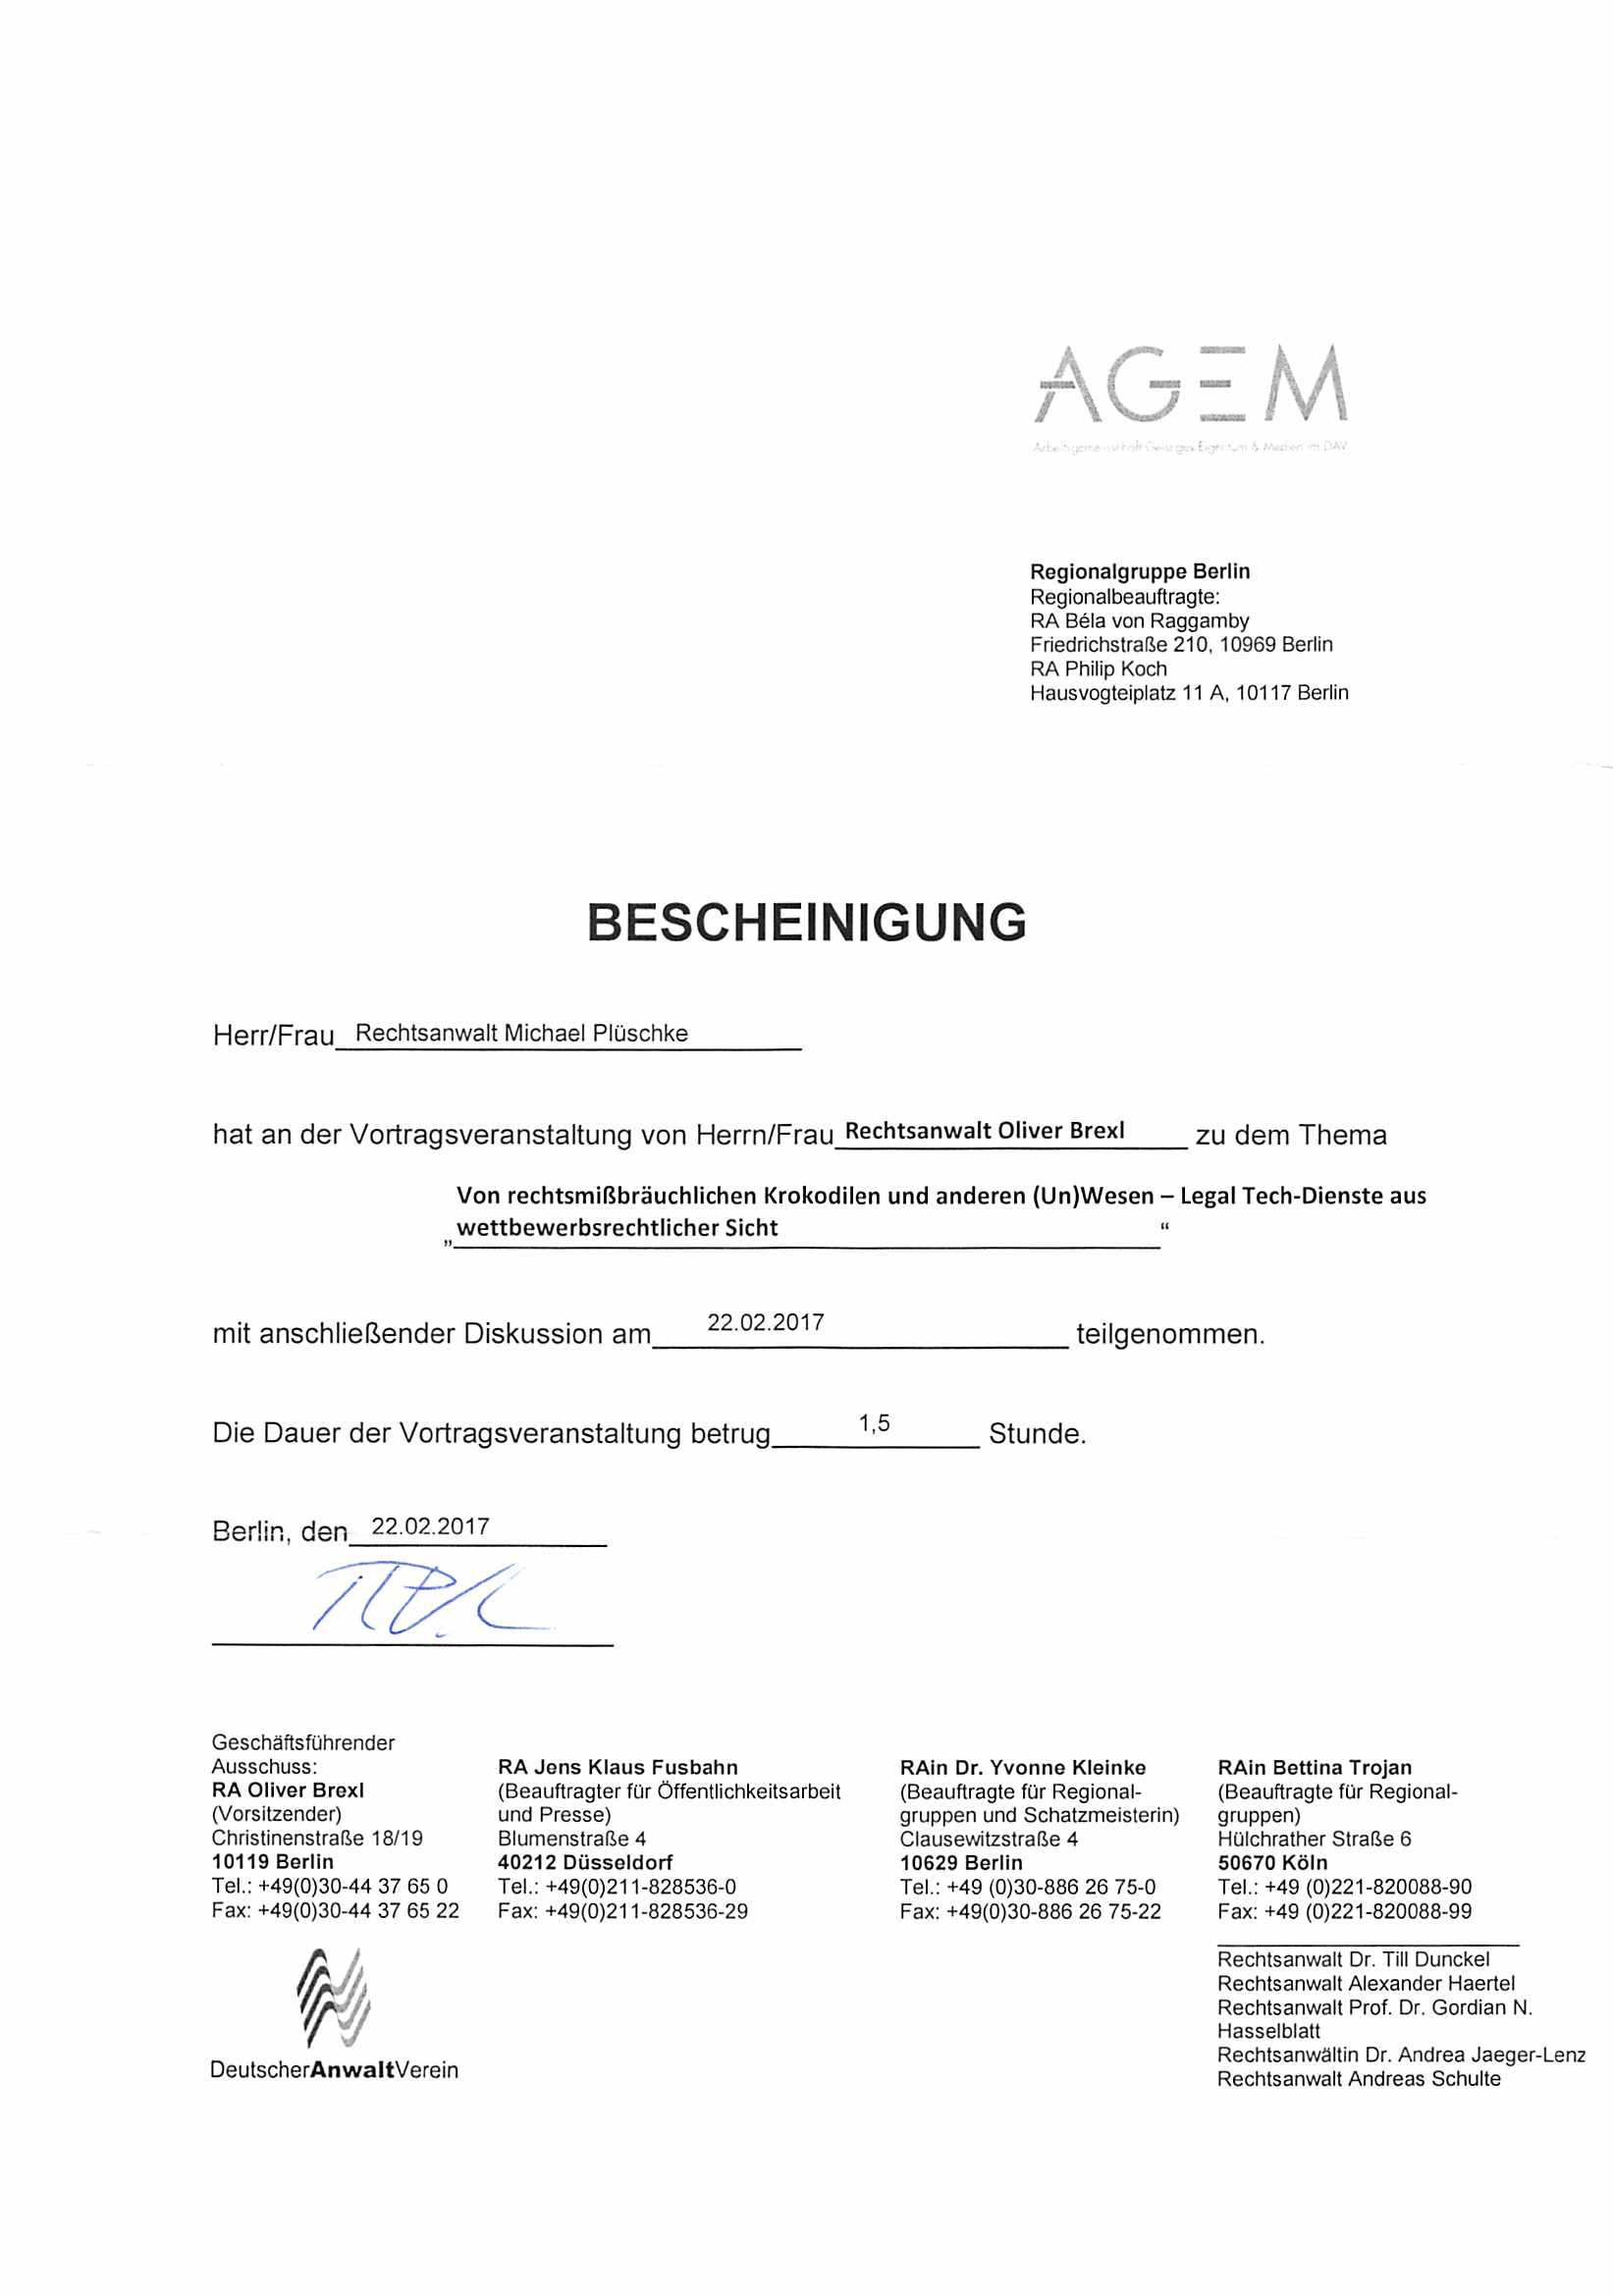 AGEM-Bescheinigung 2017